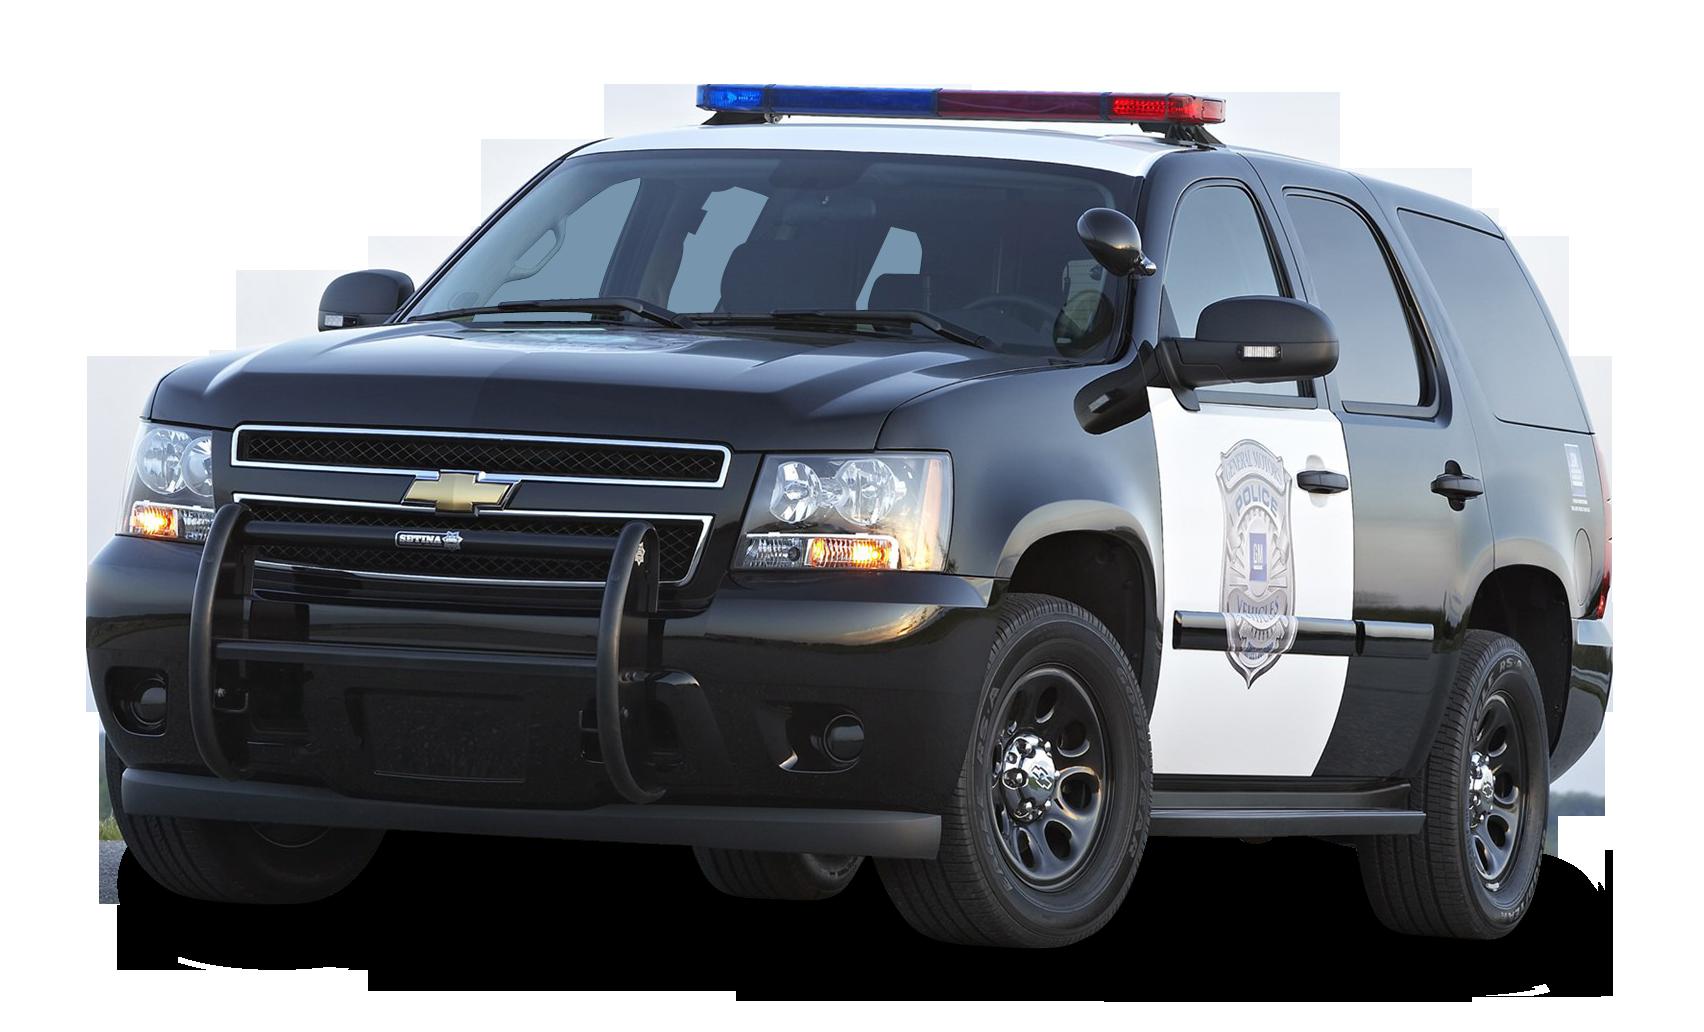 Black Chevy Tahoe Police SUV PPV Car